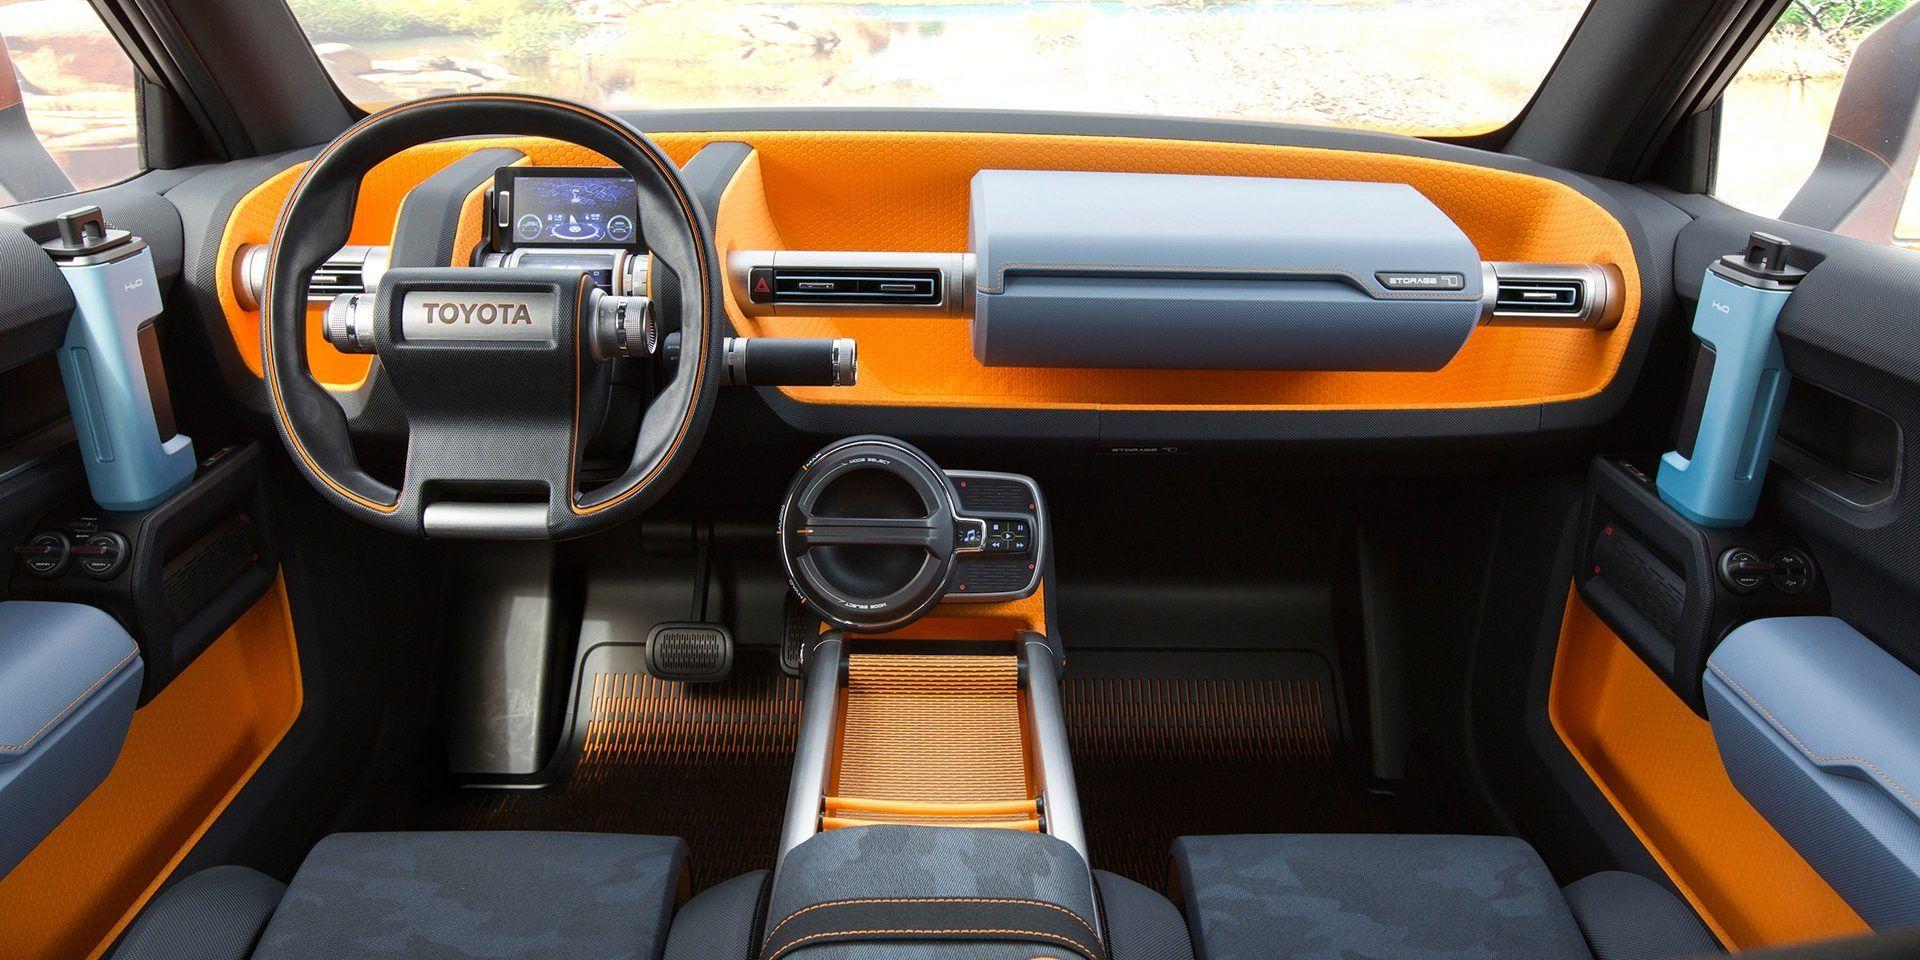 toyota ft 4x le fr re cubique du c hr cars interior pinterest. Black Bedroom Furniture Sets. Home Design Ideas